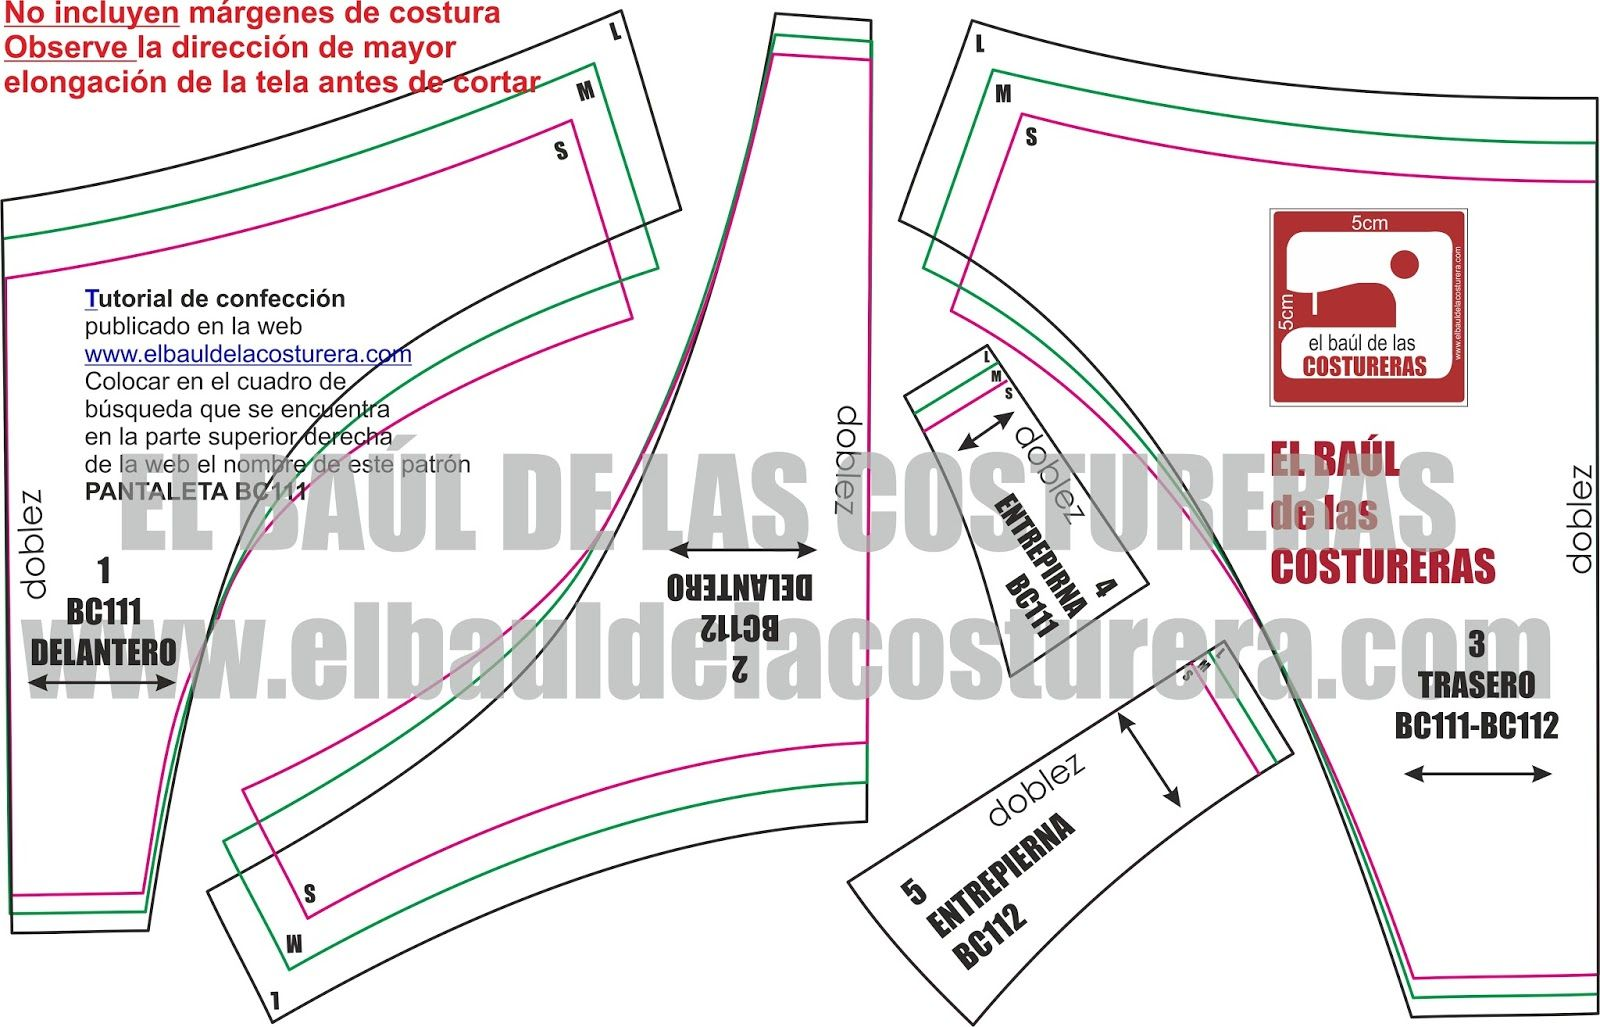 Patr n de costura gratis para pantaletas bikinis talla s - Almazuelas patrones gratis ...